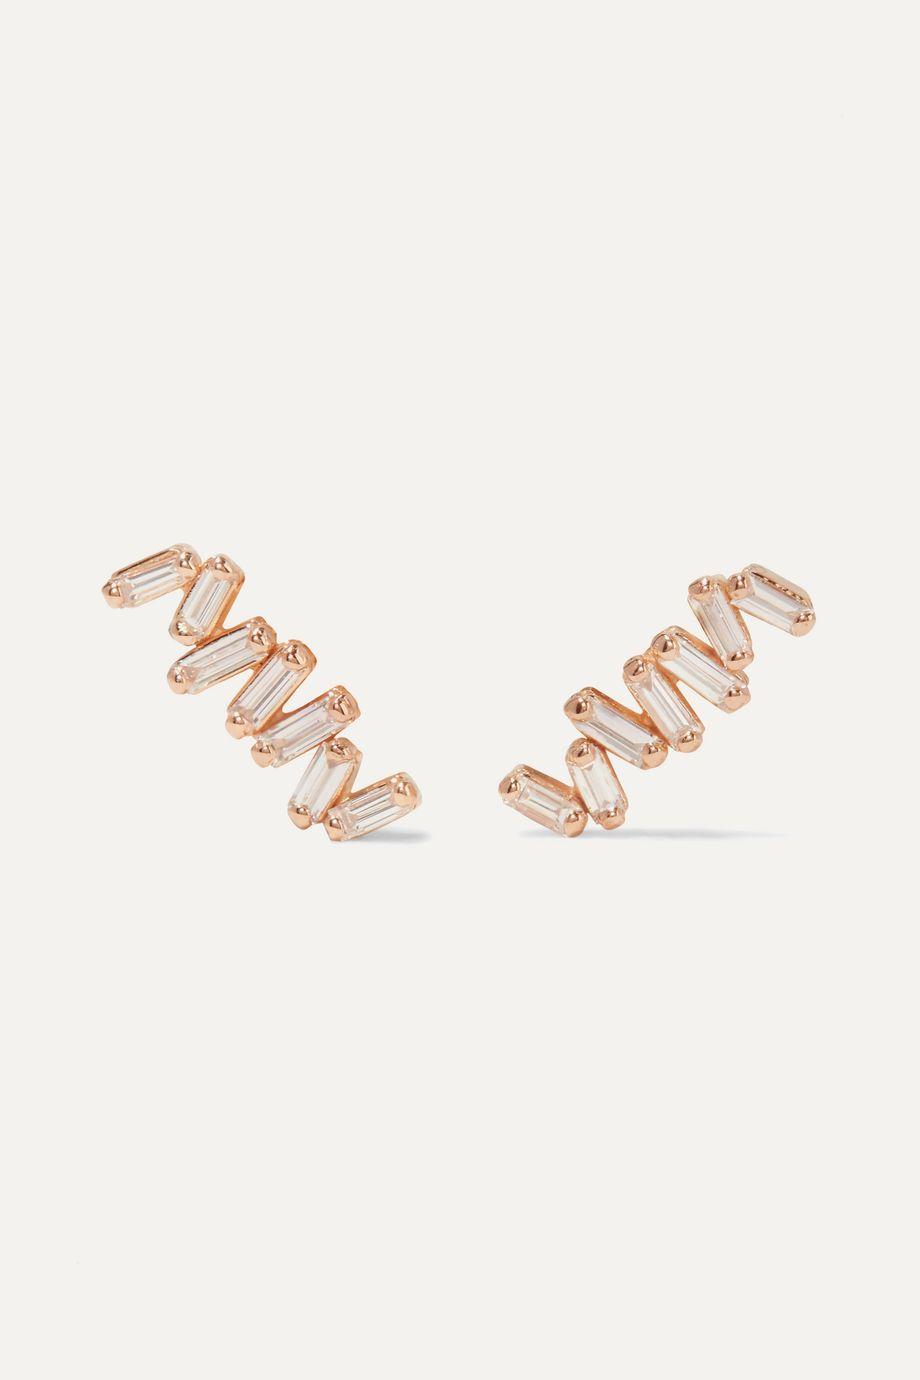 Suzanne Kalan 18-karat rose gold diamond earrings